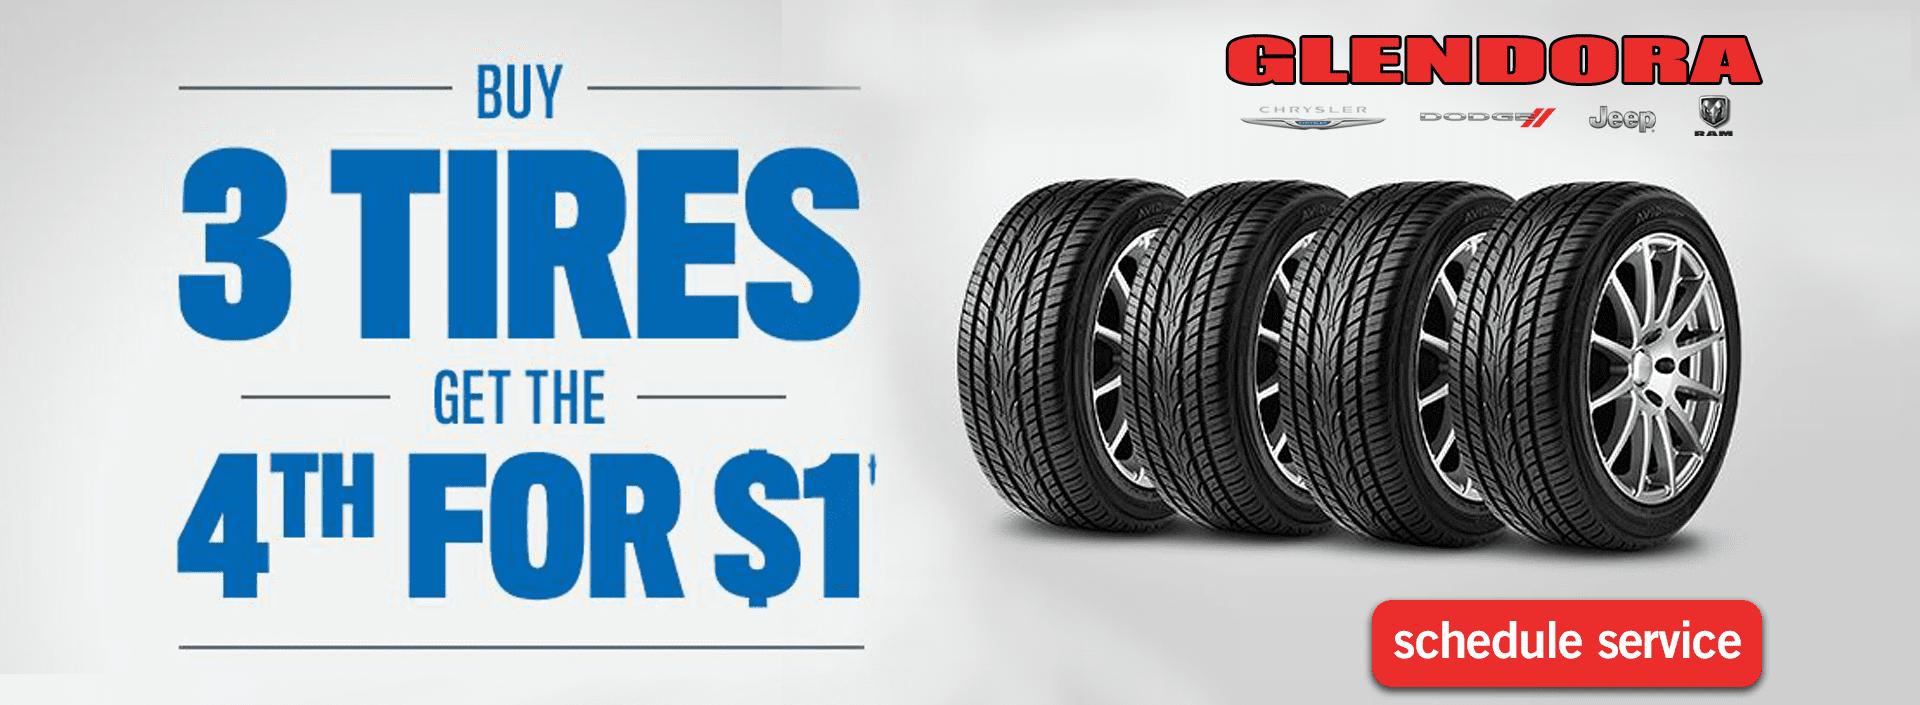 Glendora_CDJR_2021_Buy3_Tires_Sales